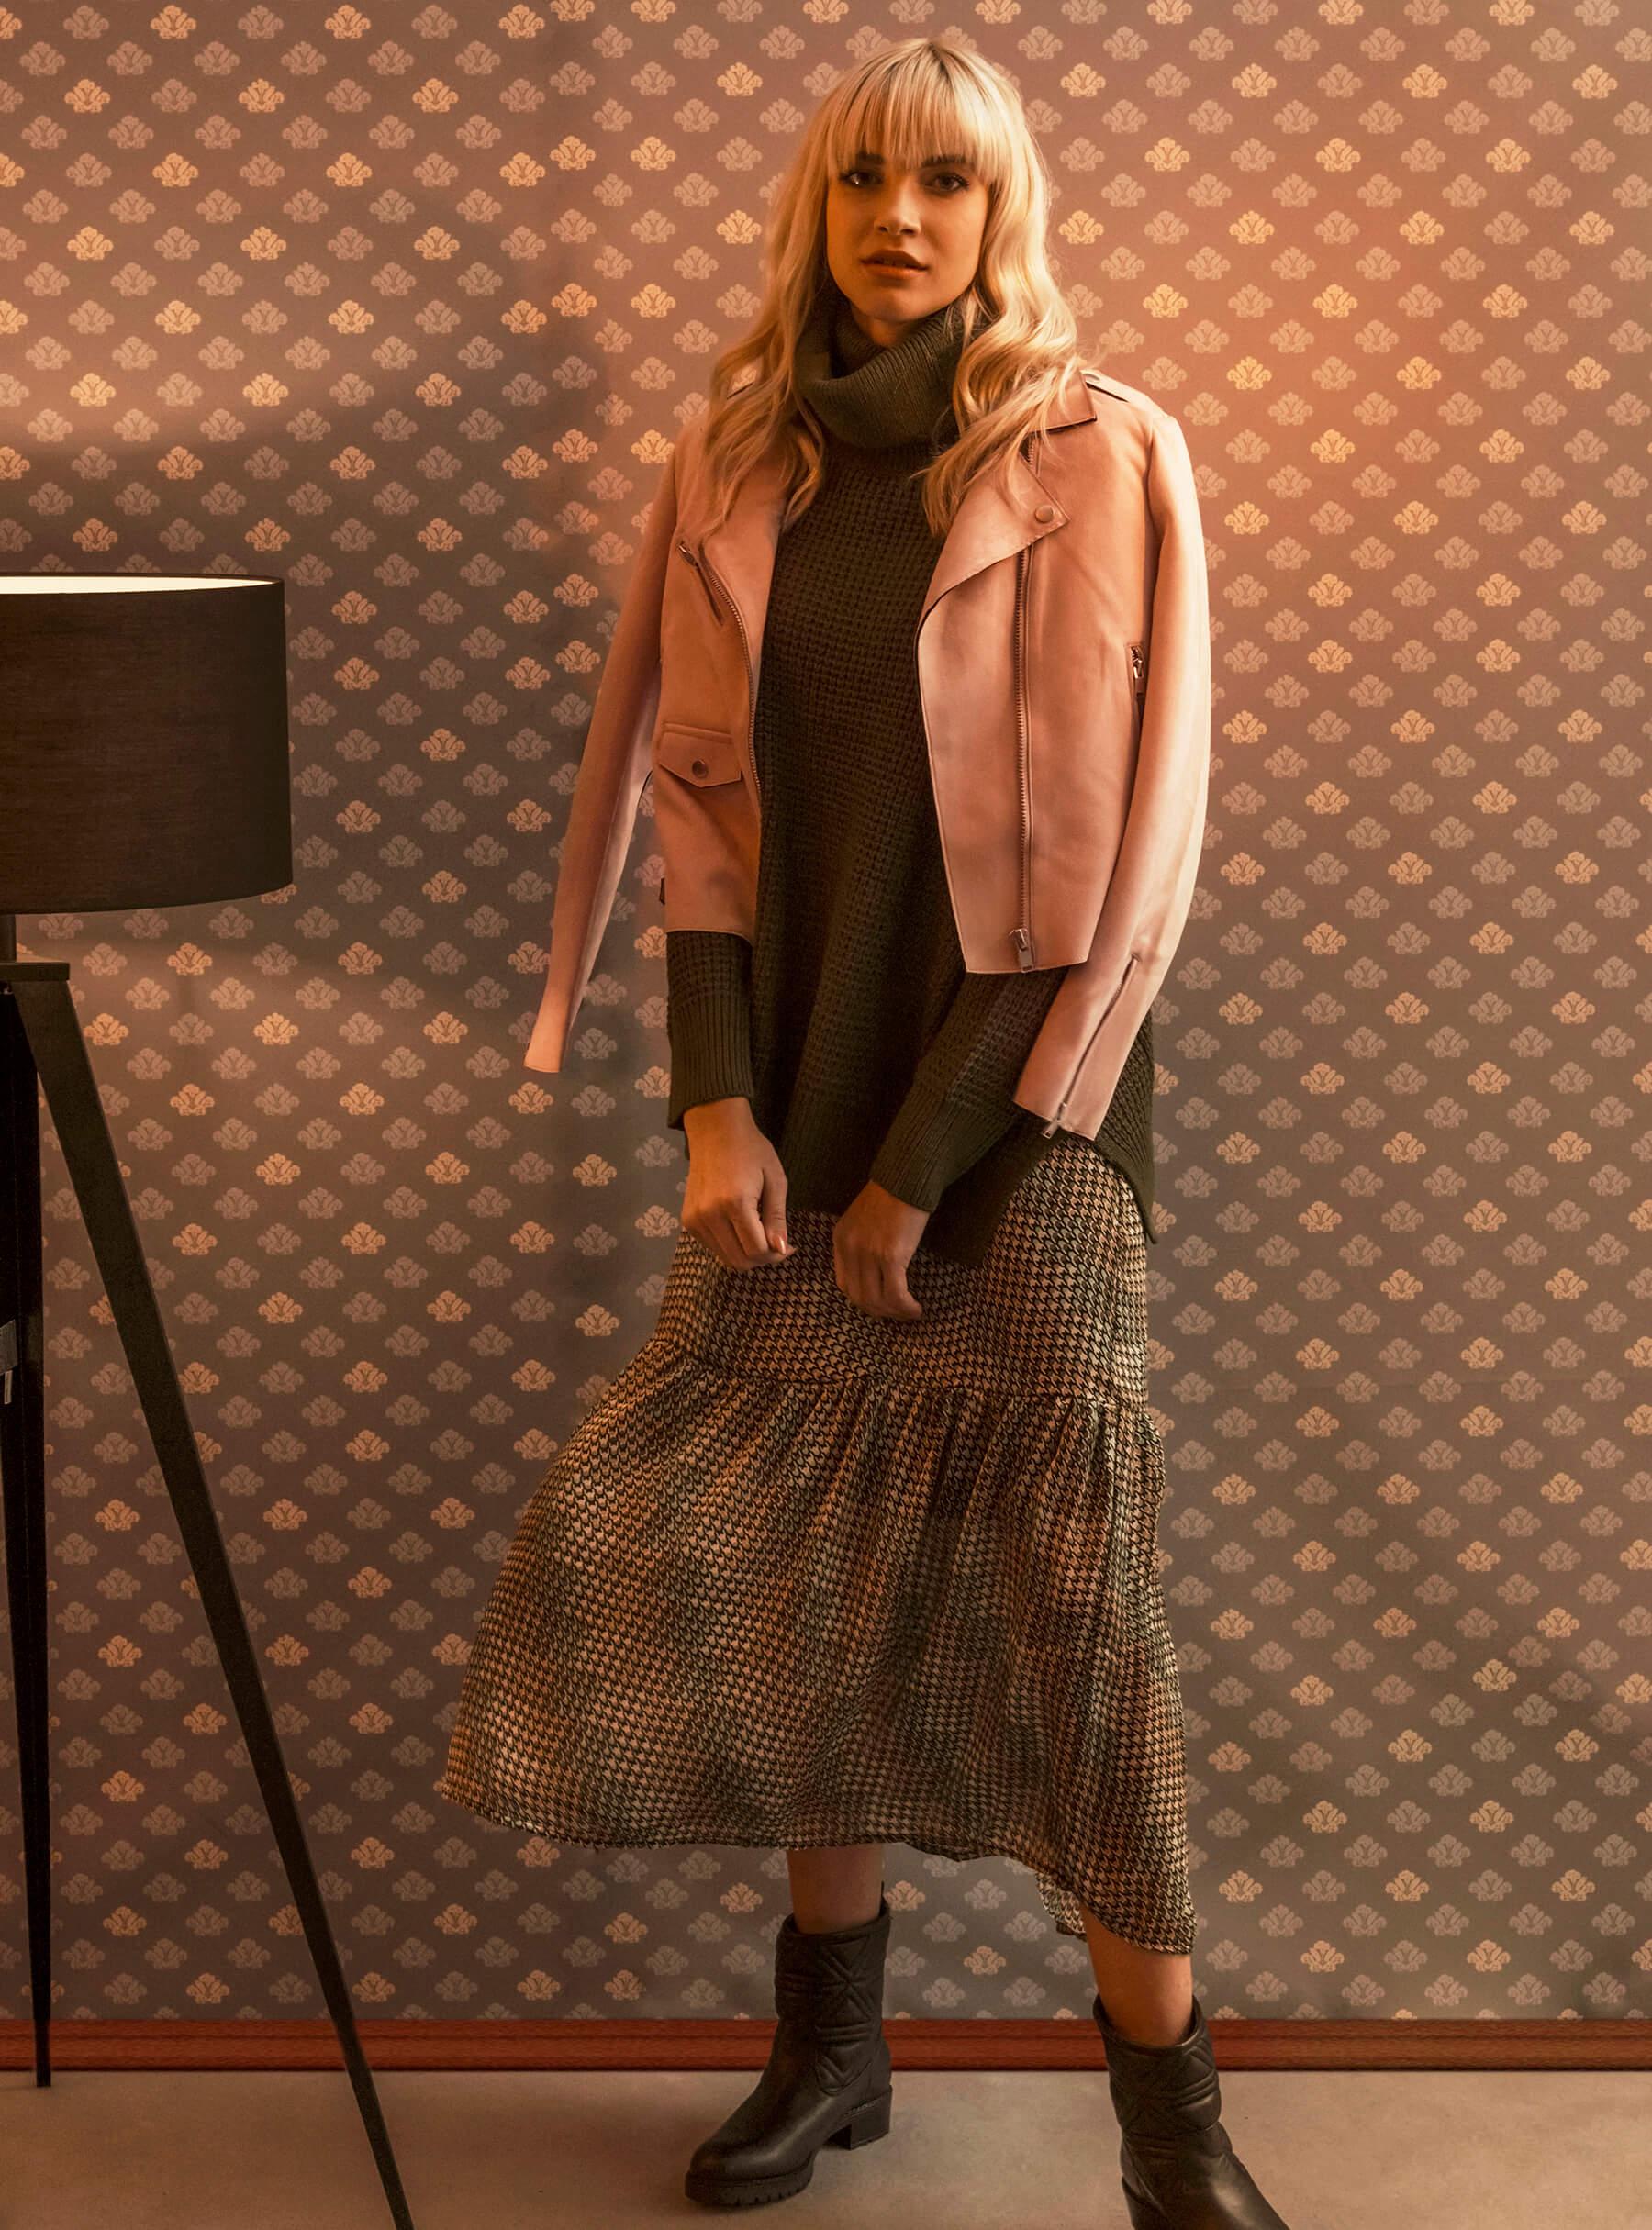 Vero Moda pulover 239 hrk Vero Moda haljina 399 hrk